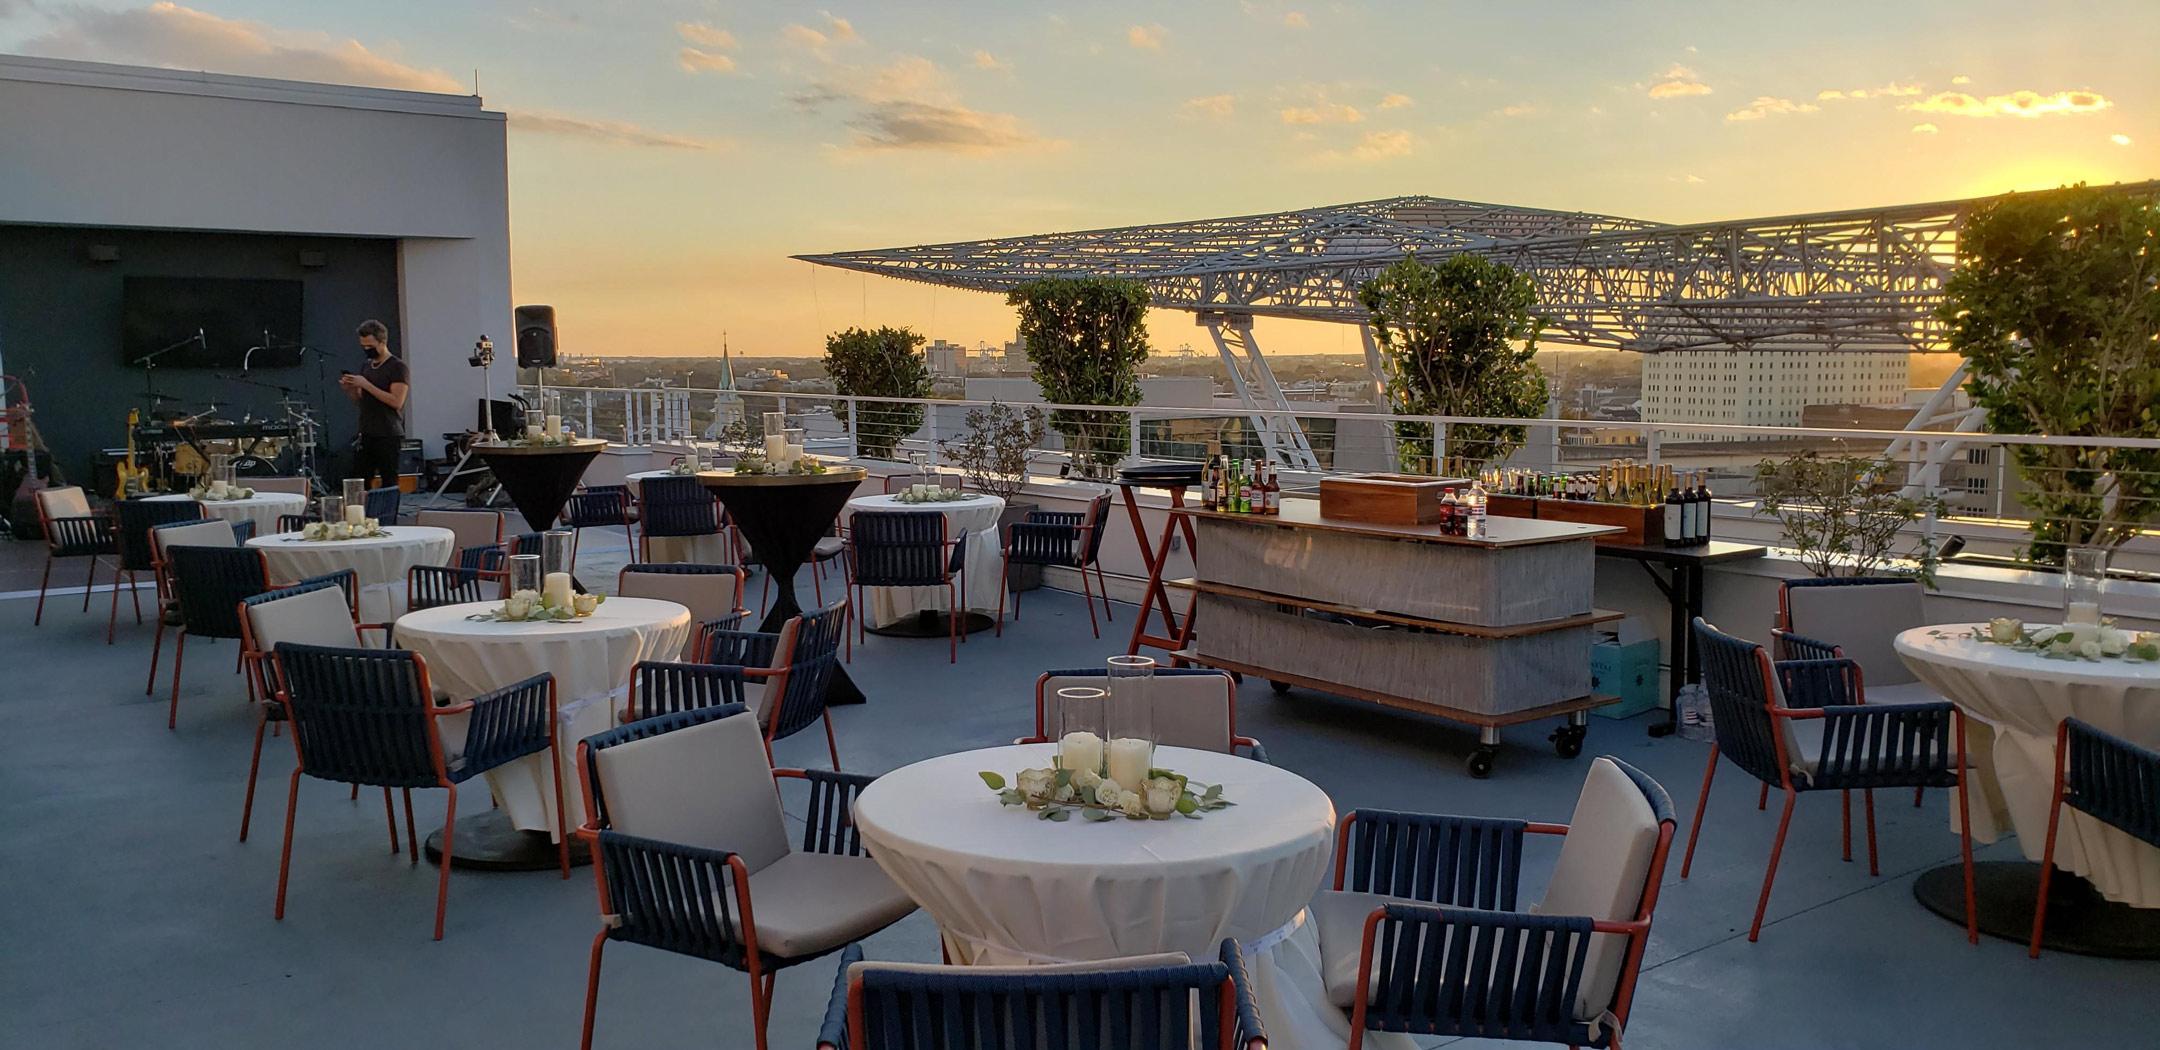 Rosie's on the Rooftop | HIggins Hotel NOLA